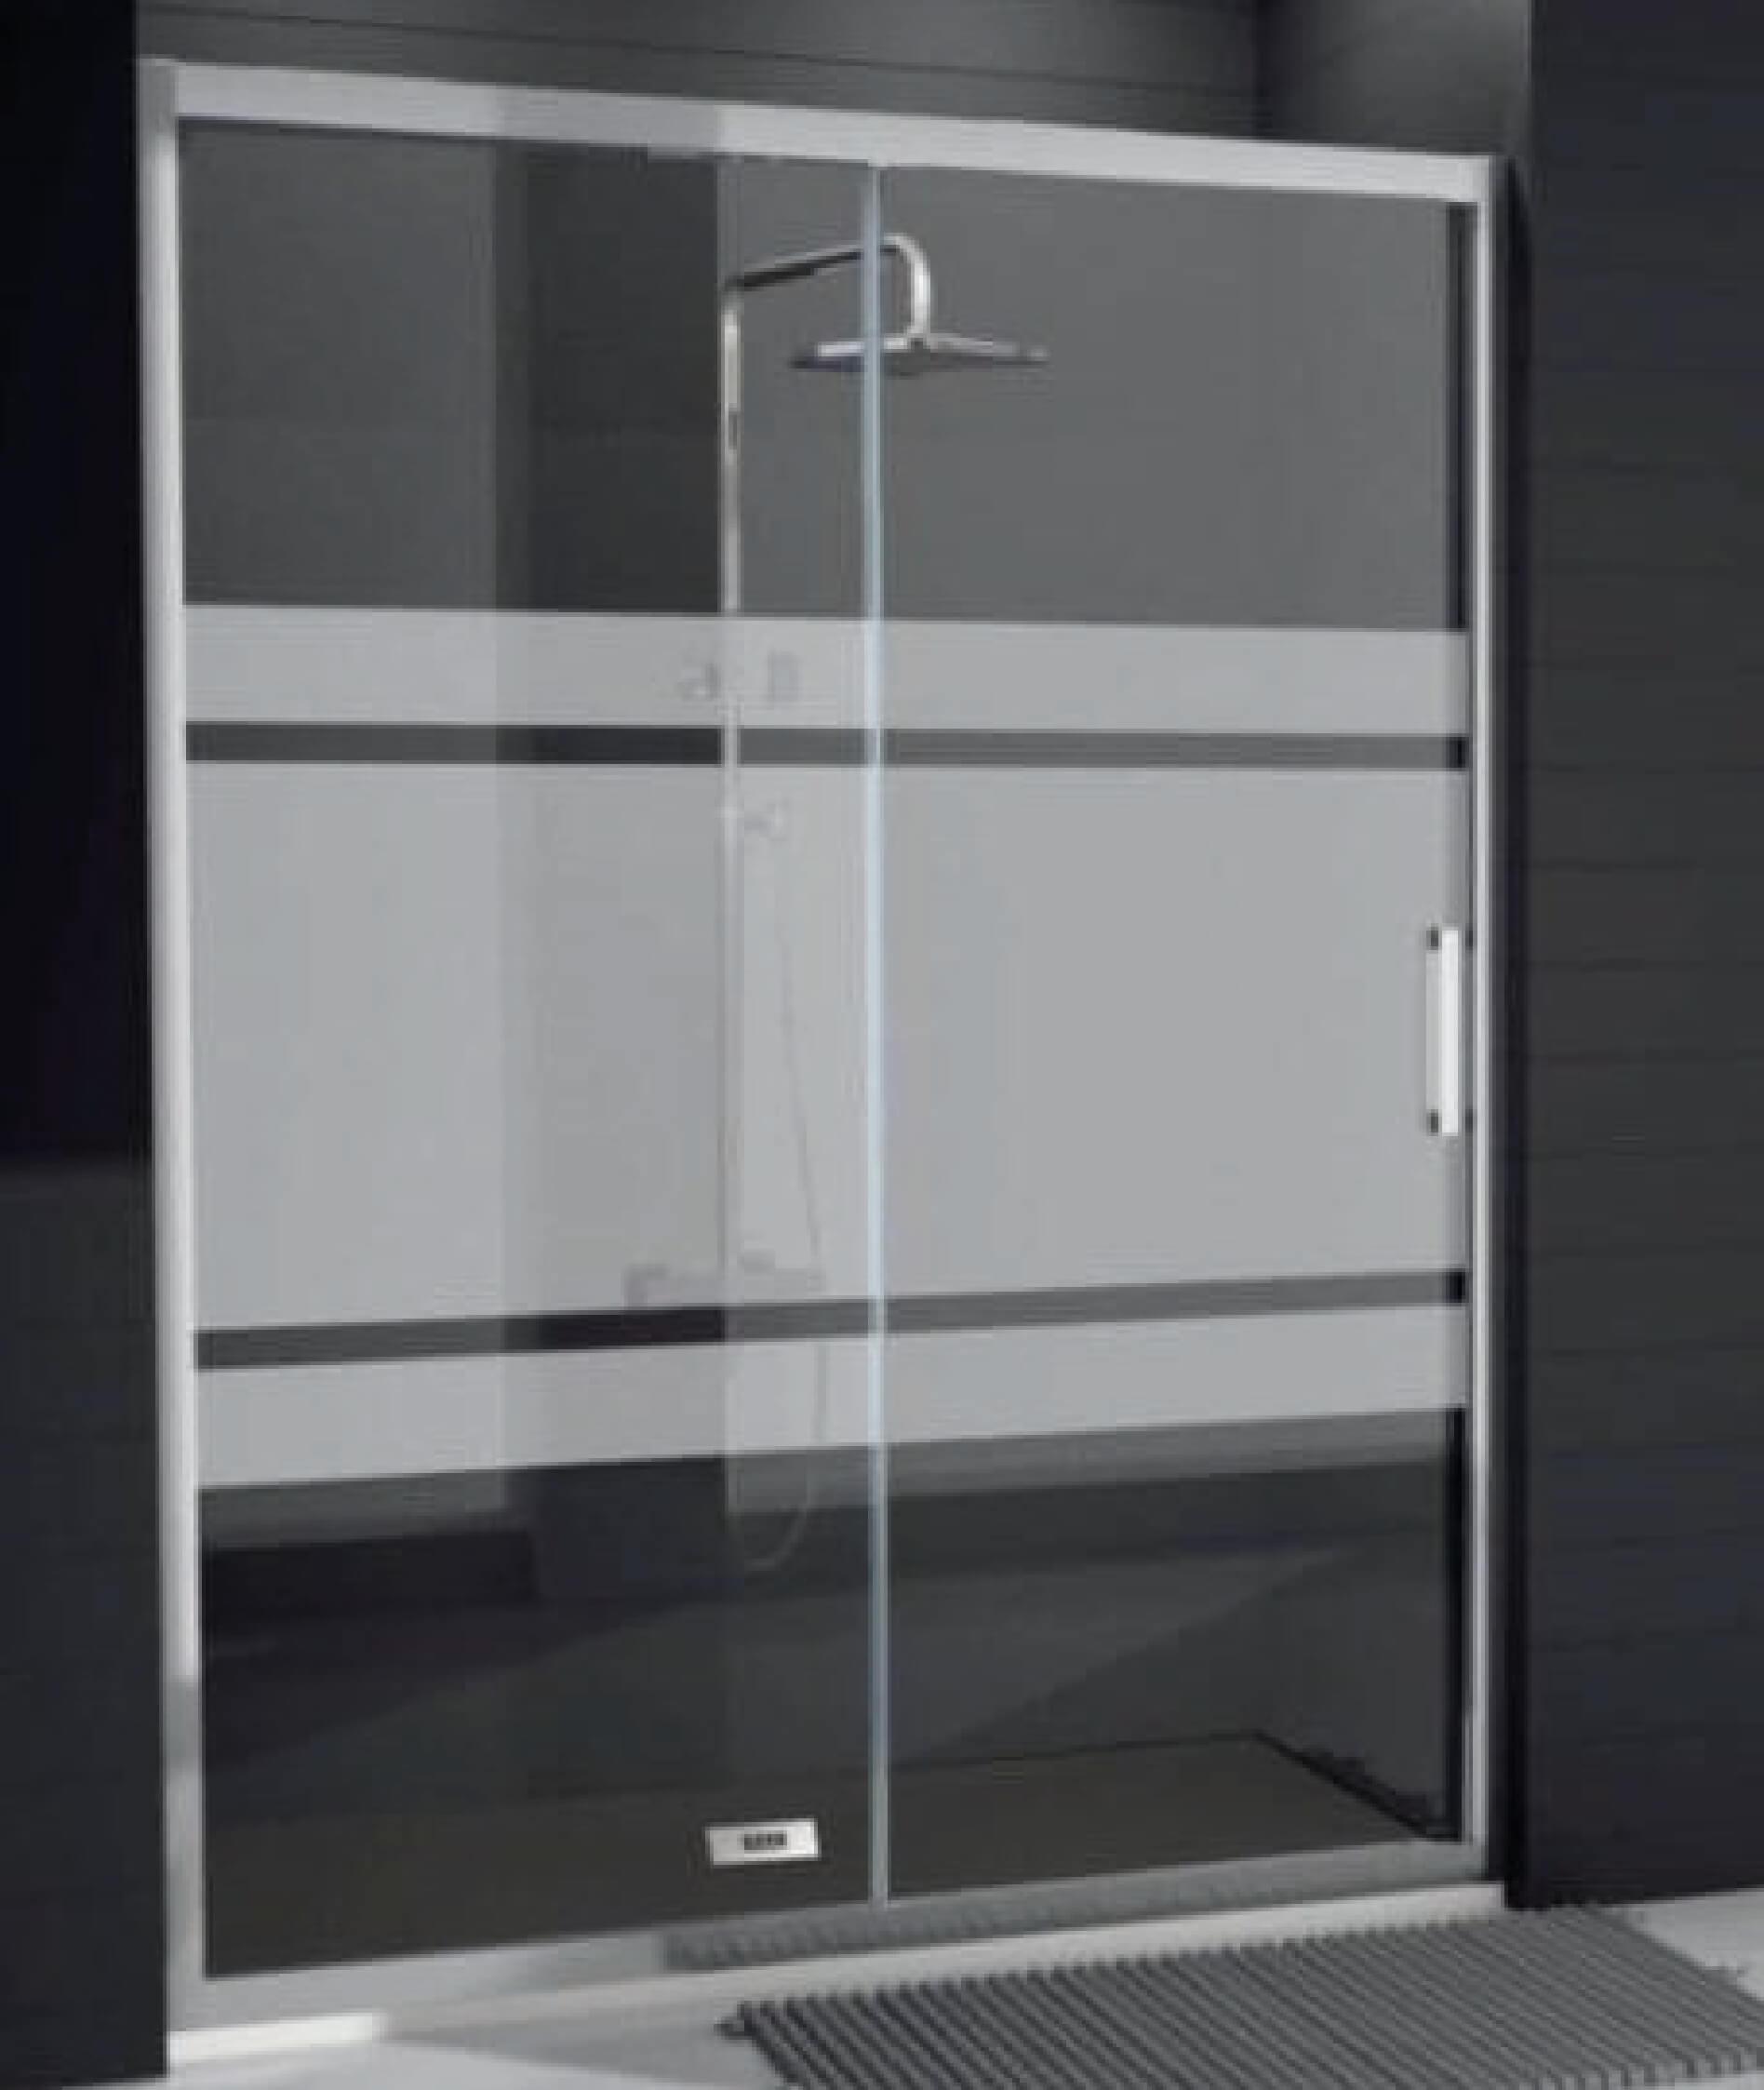 Puerta mampara de vidrio hidrotor - Mampara de vidrio ...